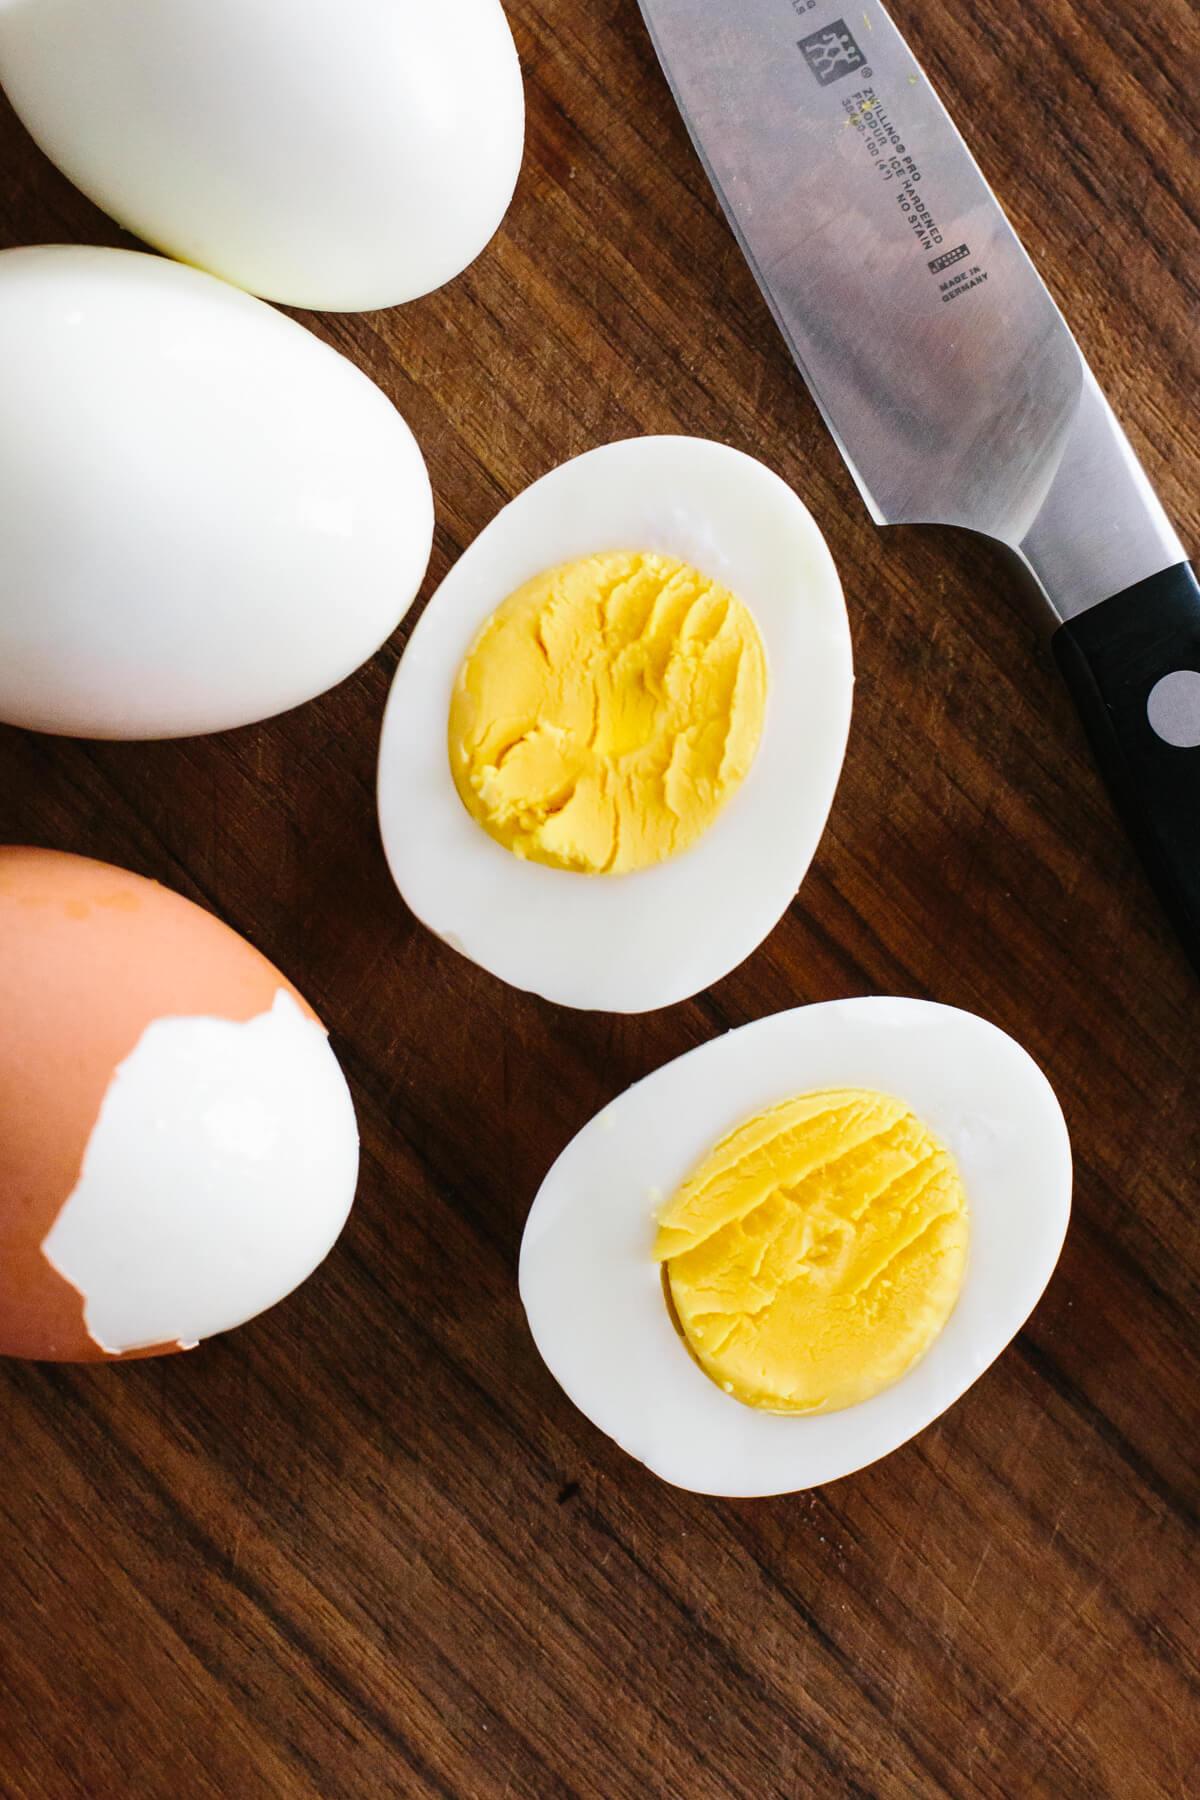 Slicing hard boiled eggs in half.